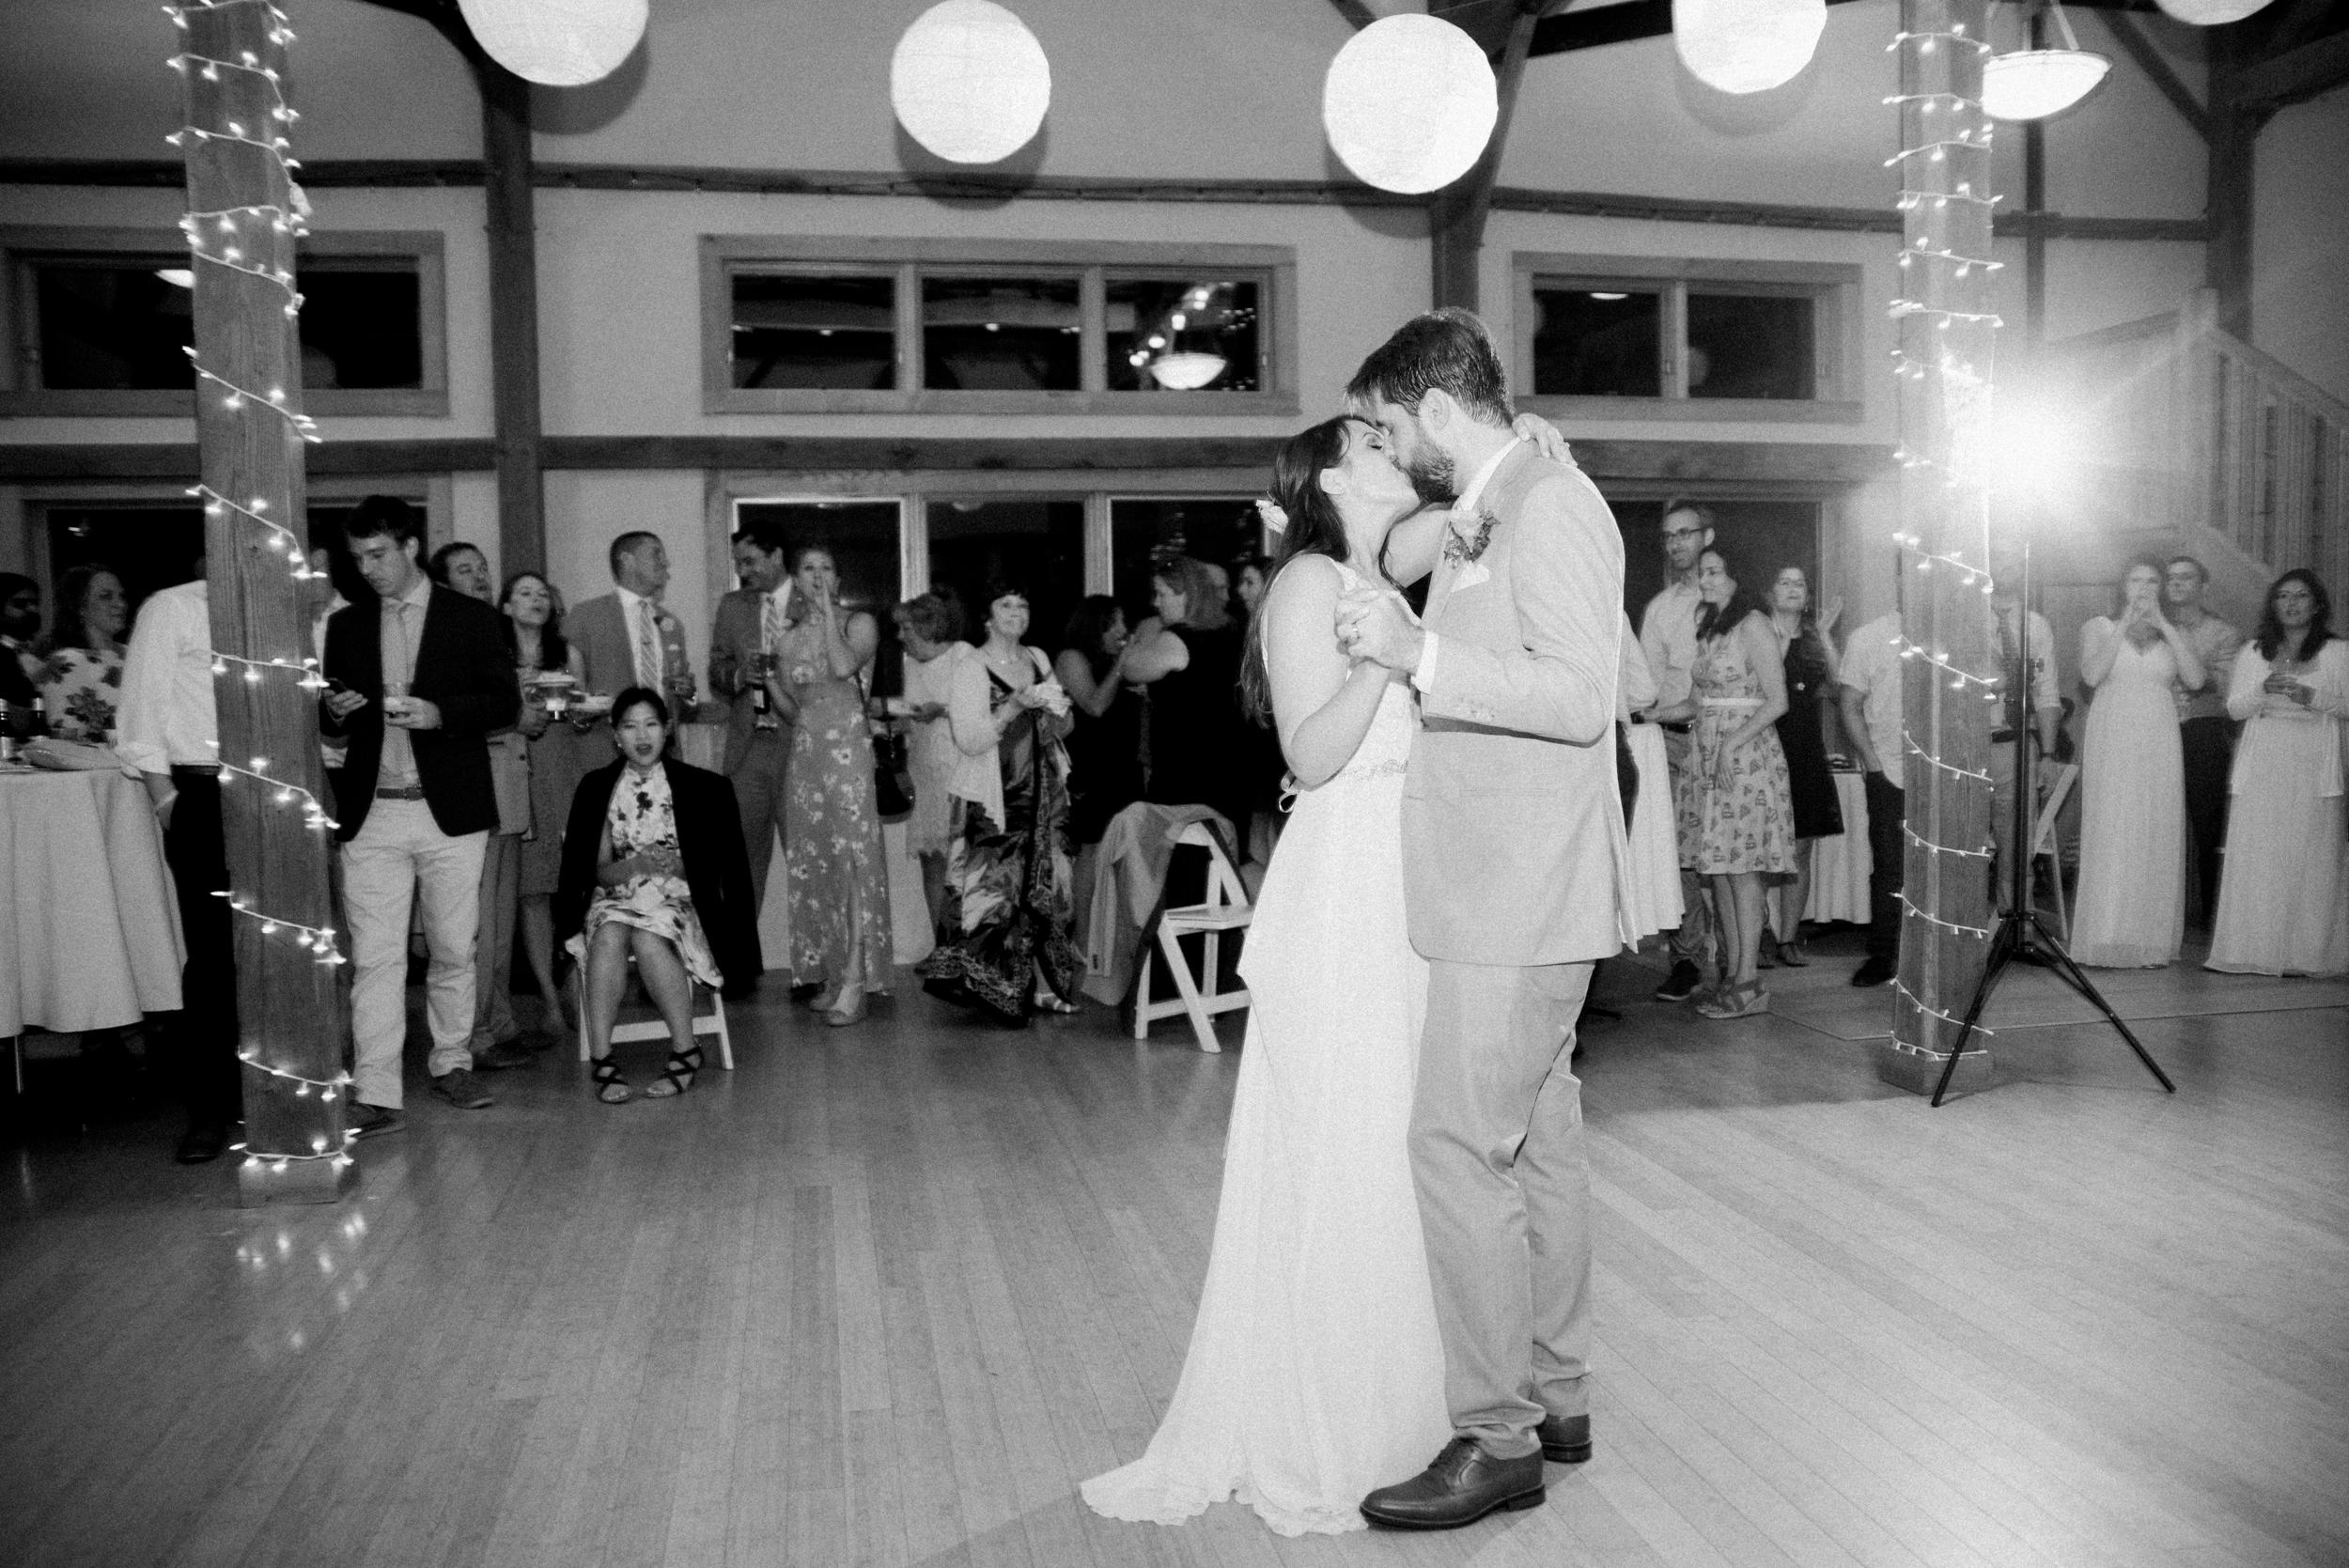 Amherst Mass wedding Photographer